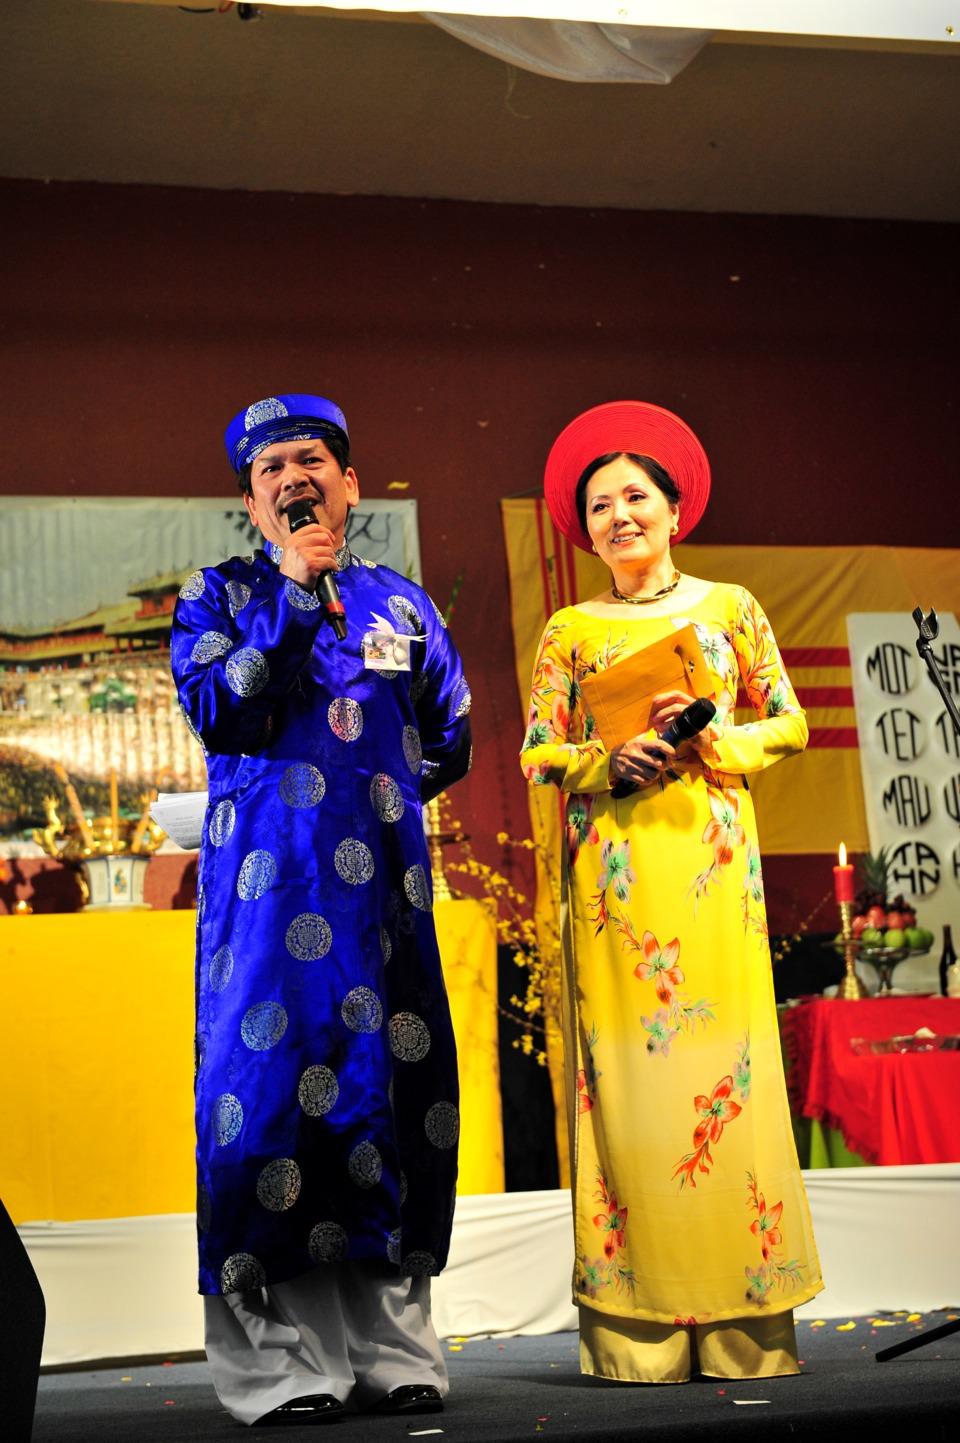 Hoi Dong Huong 2013 - Hue Association - Image 029